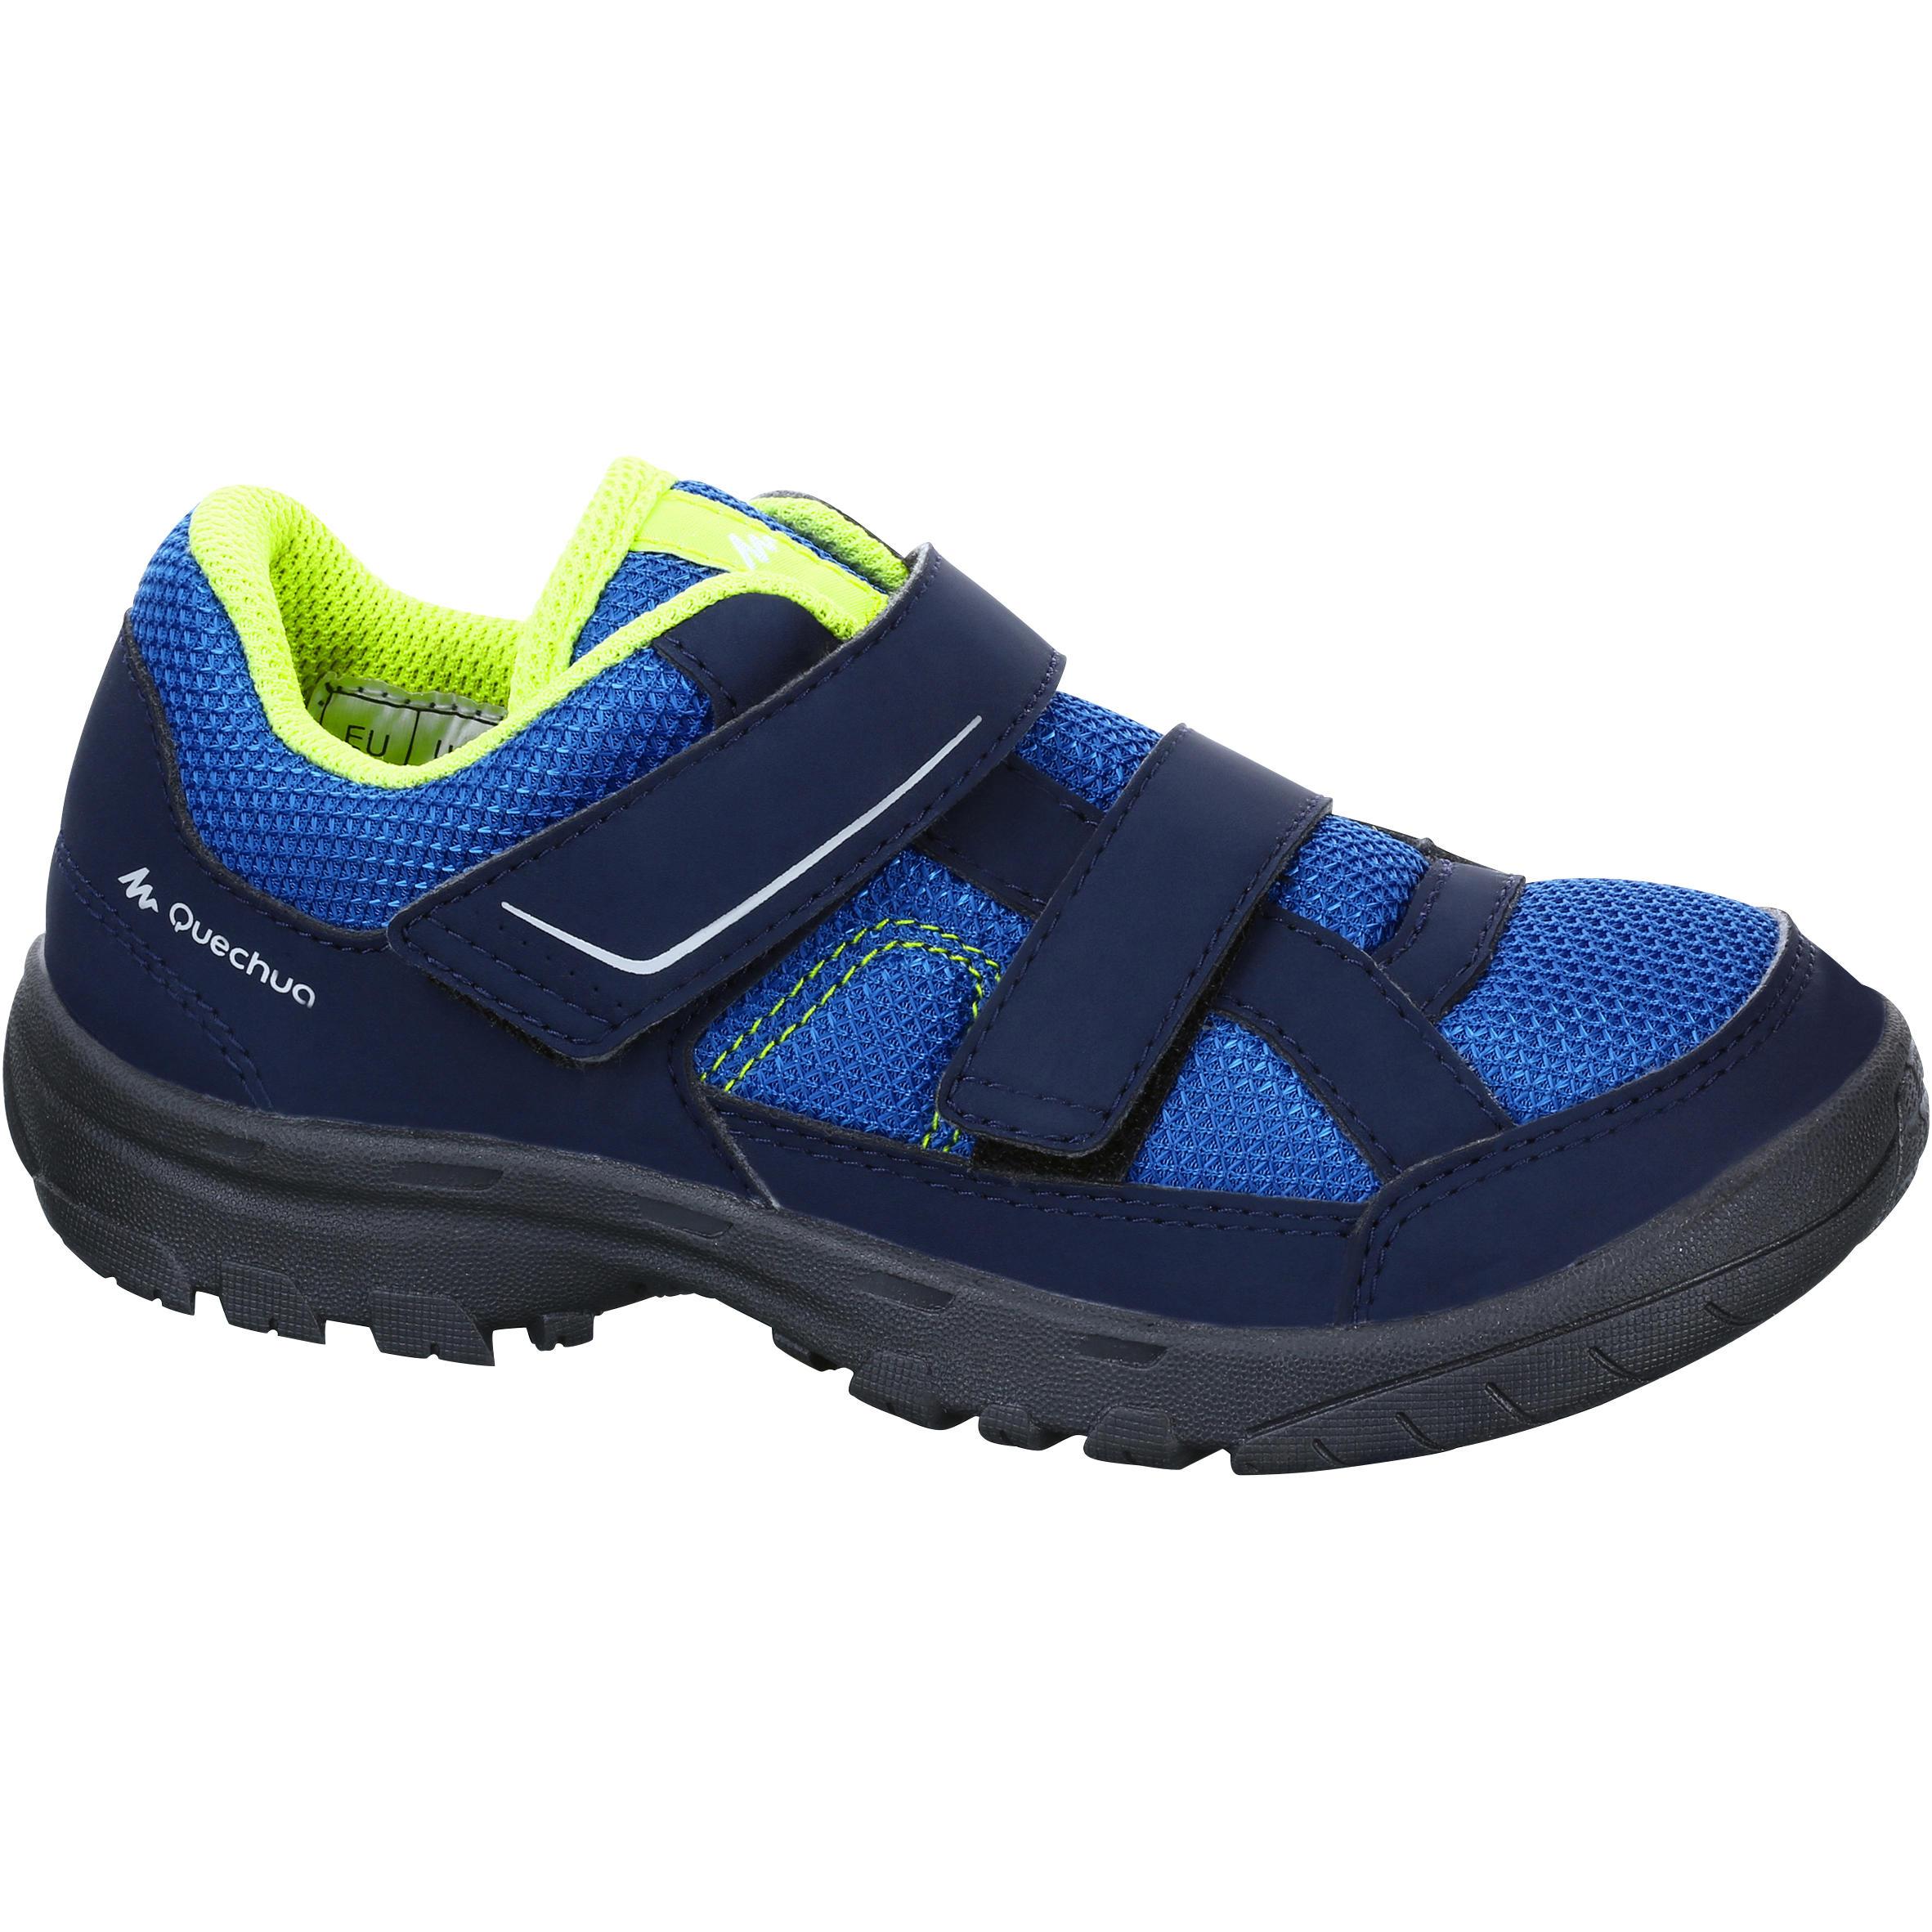 Kids hiking shoes NH100 - Blue